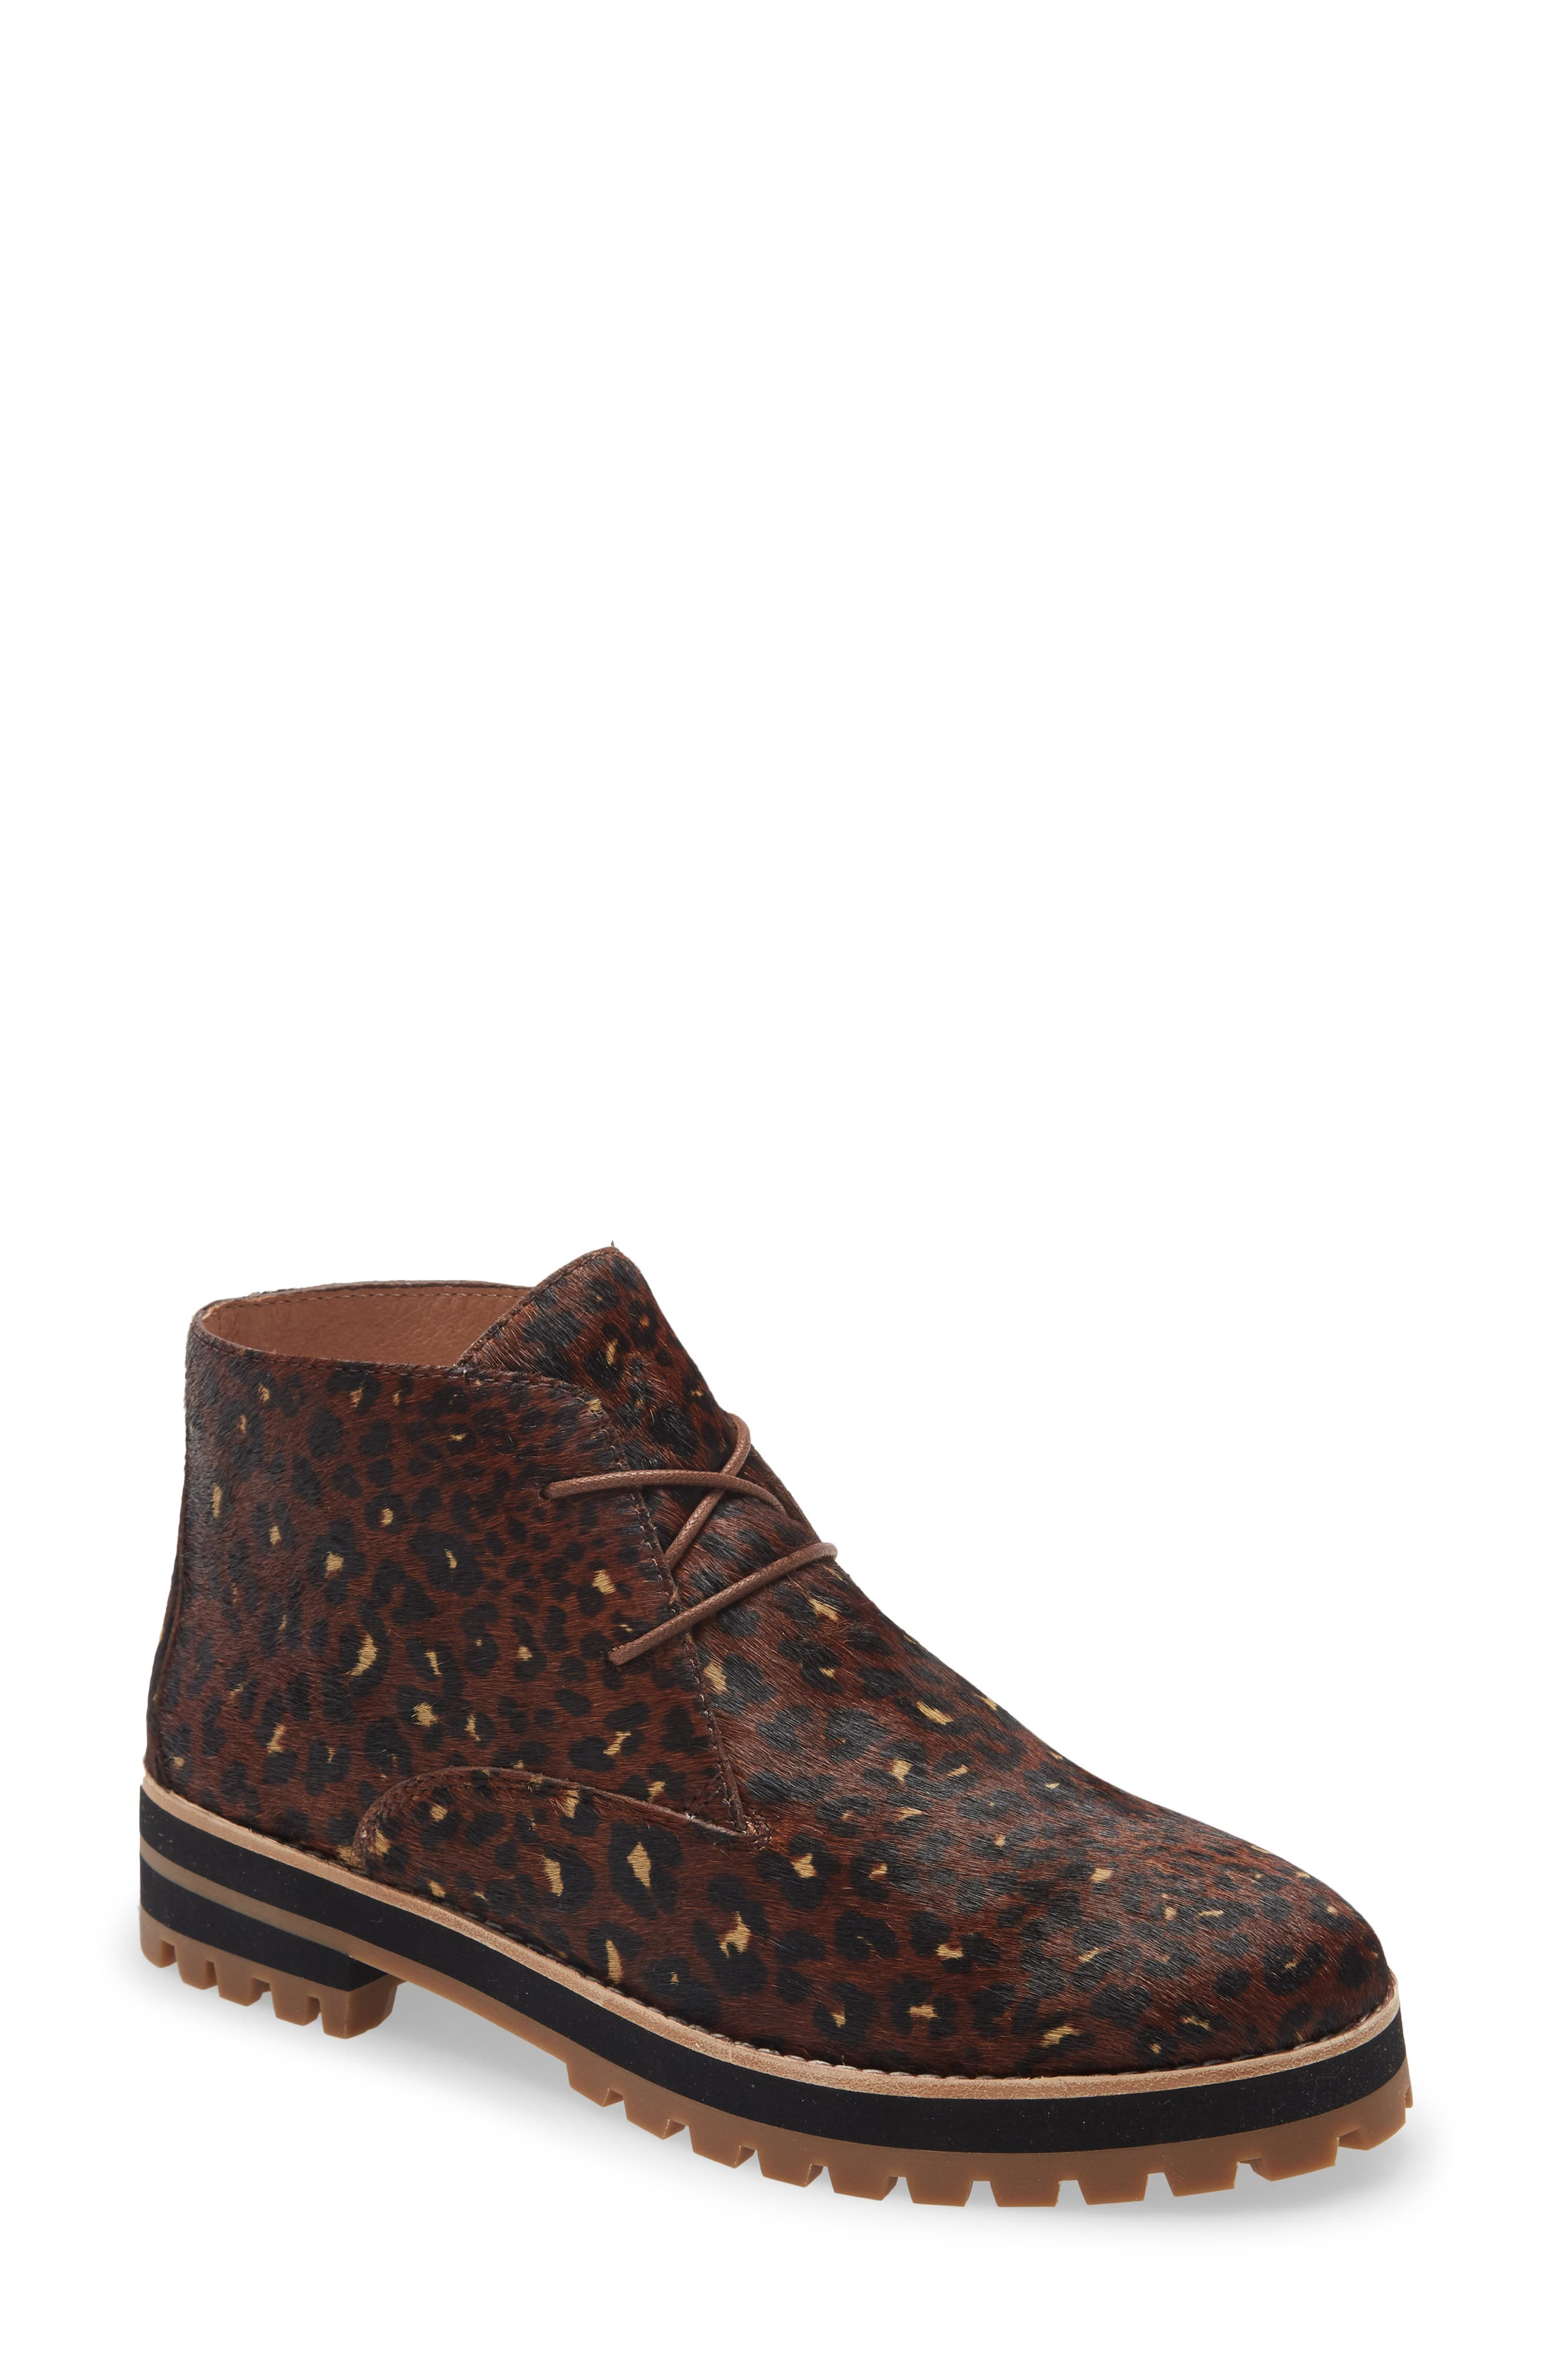 Madewell Boots \u0026 Booties | Nordstrom